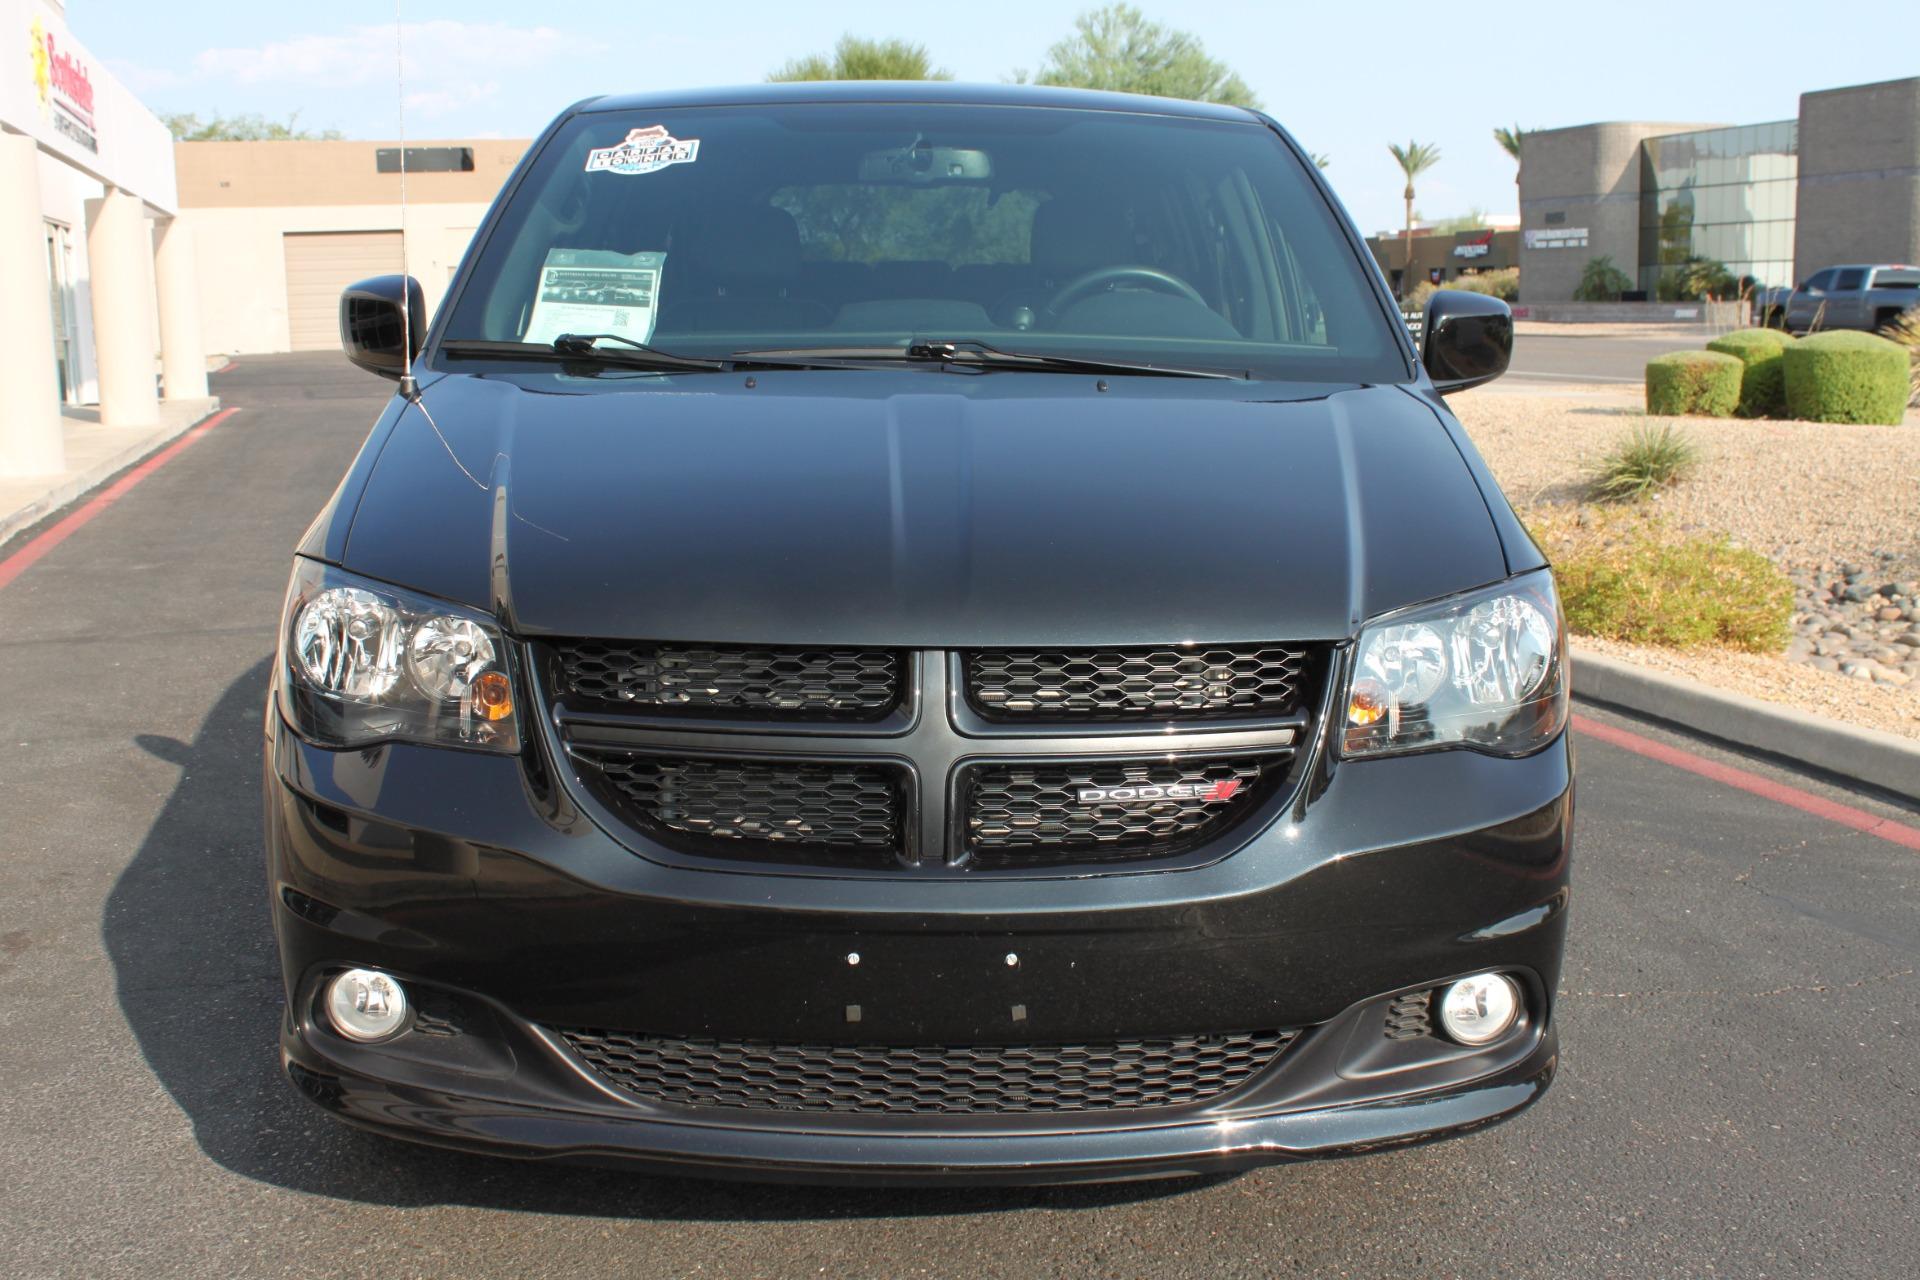 Used-2018-Dodge-Grand-Caravan-SXT-Rollx-Mobility-Conversion-Grand-Cherokee